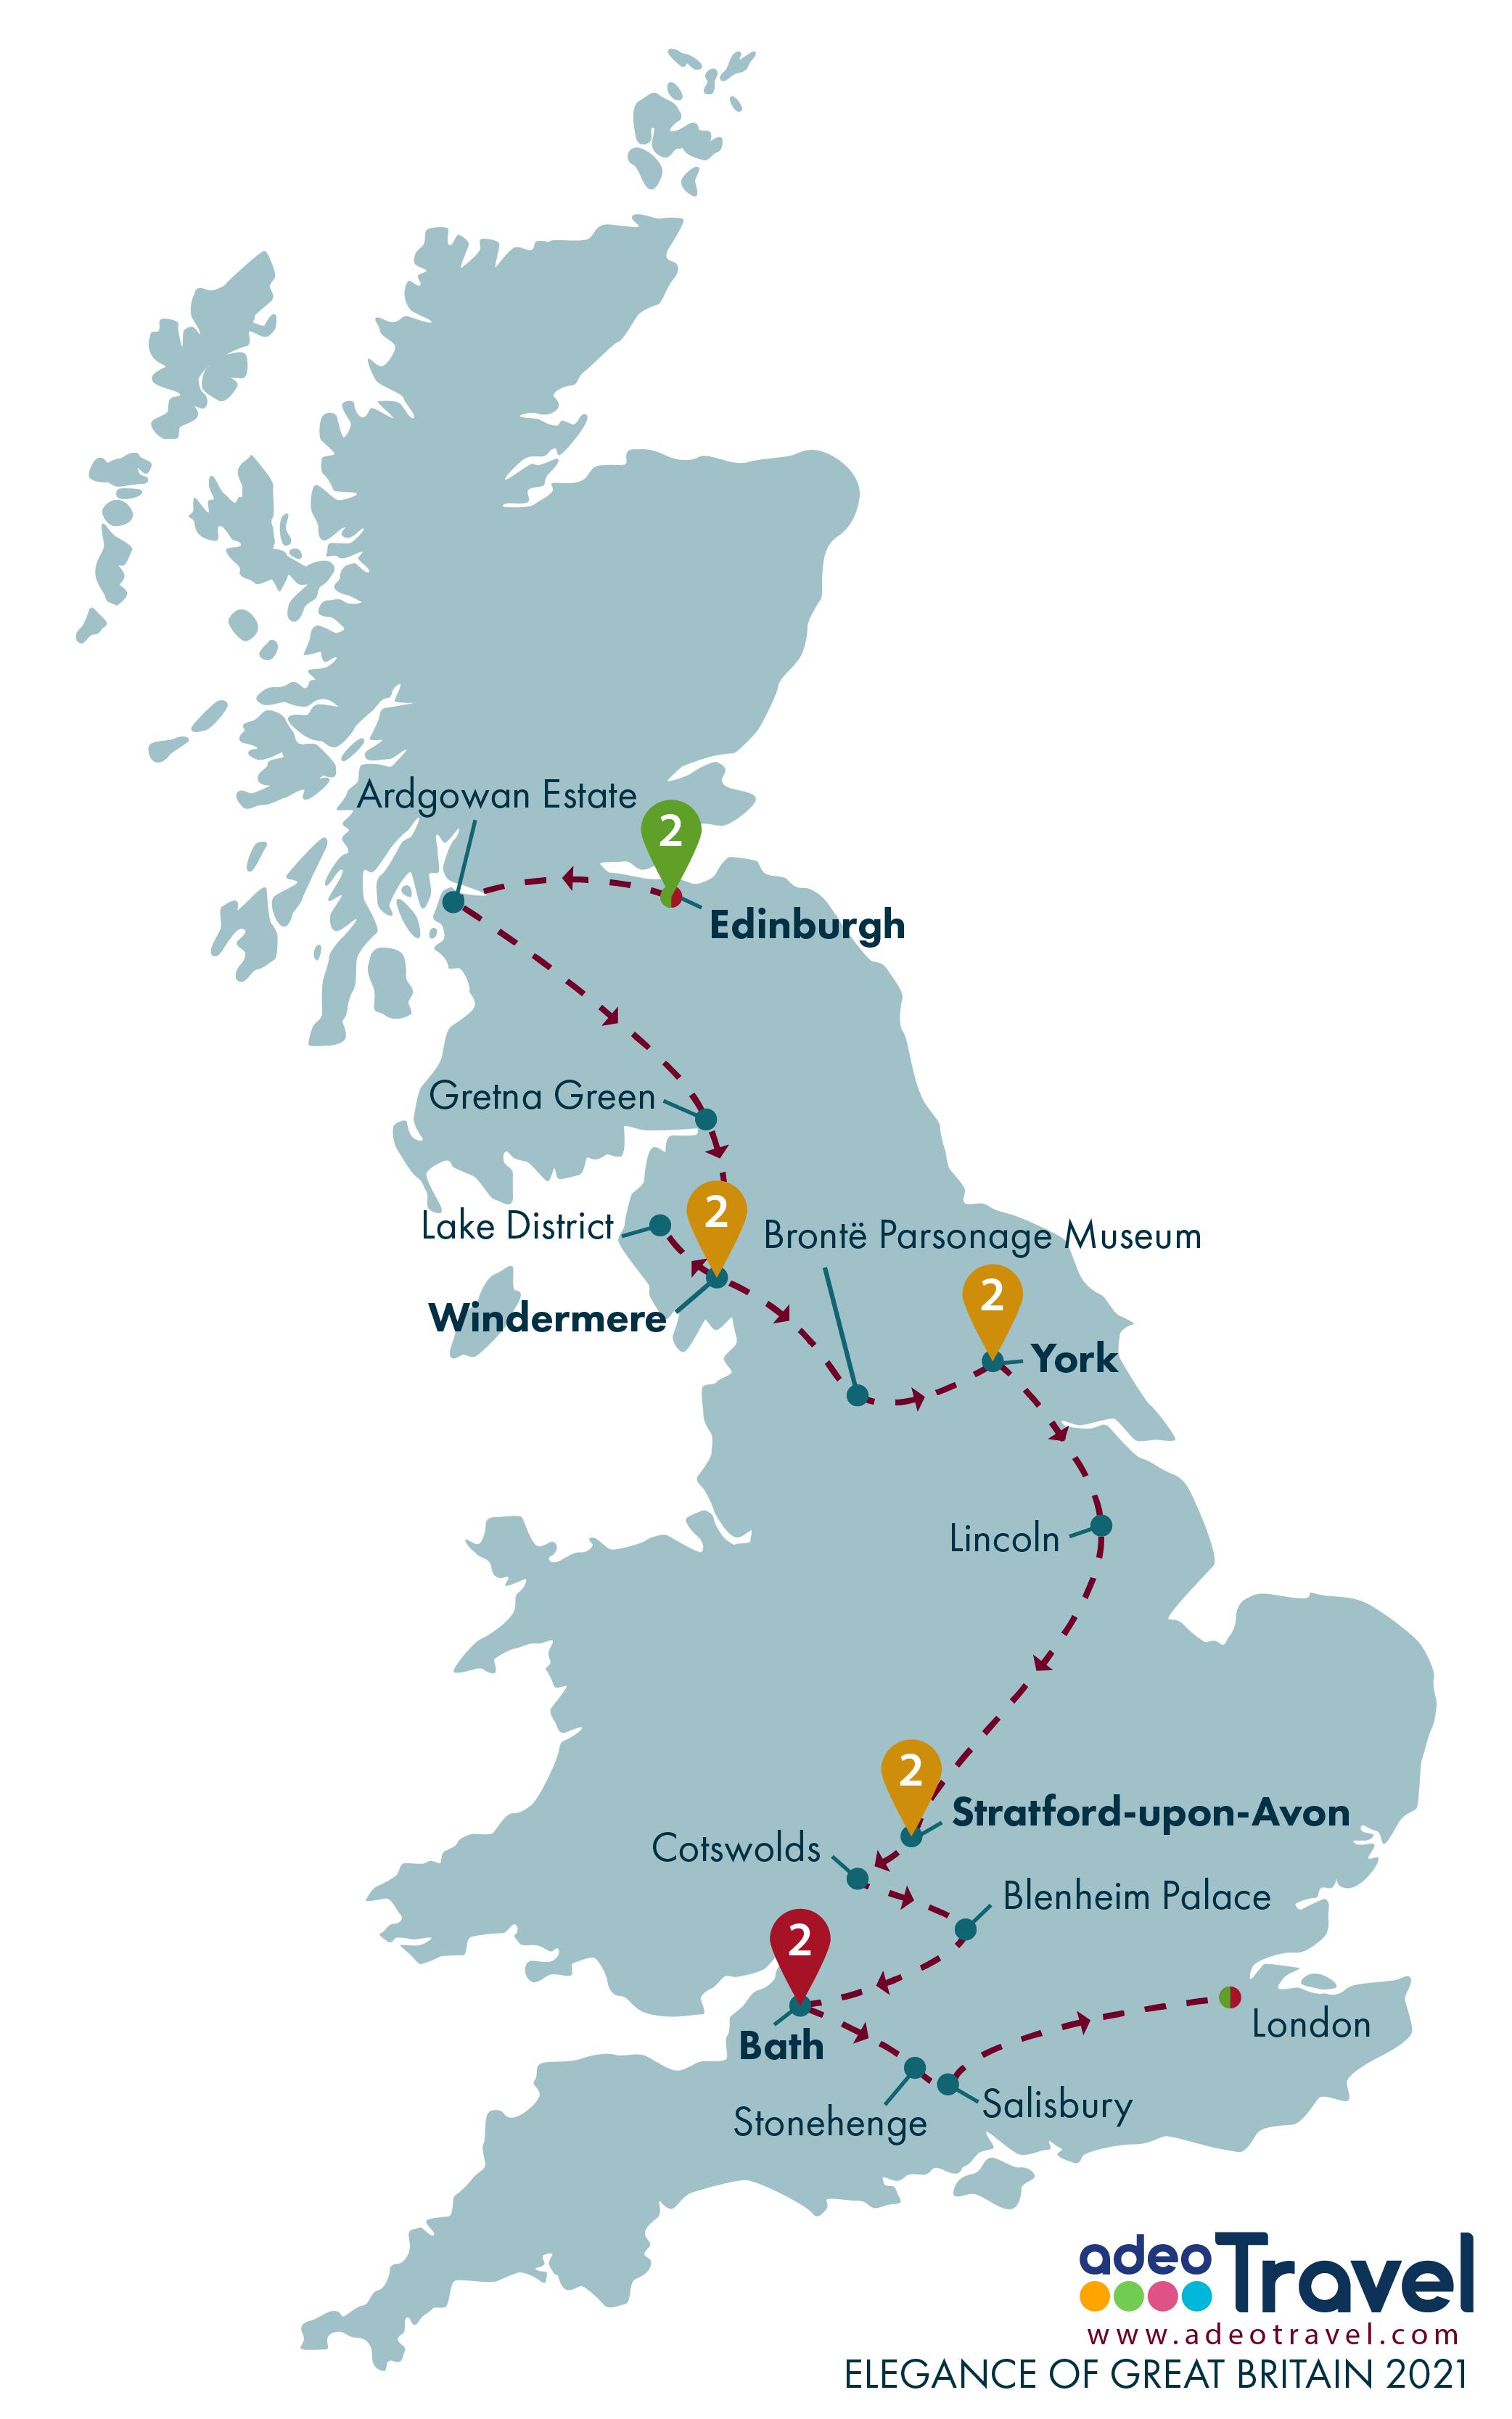 Map - Elegance of Great Britain 2021